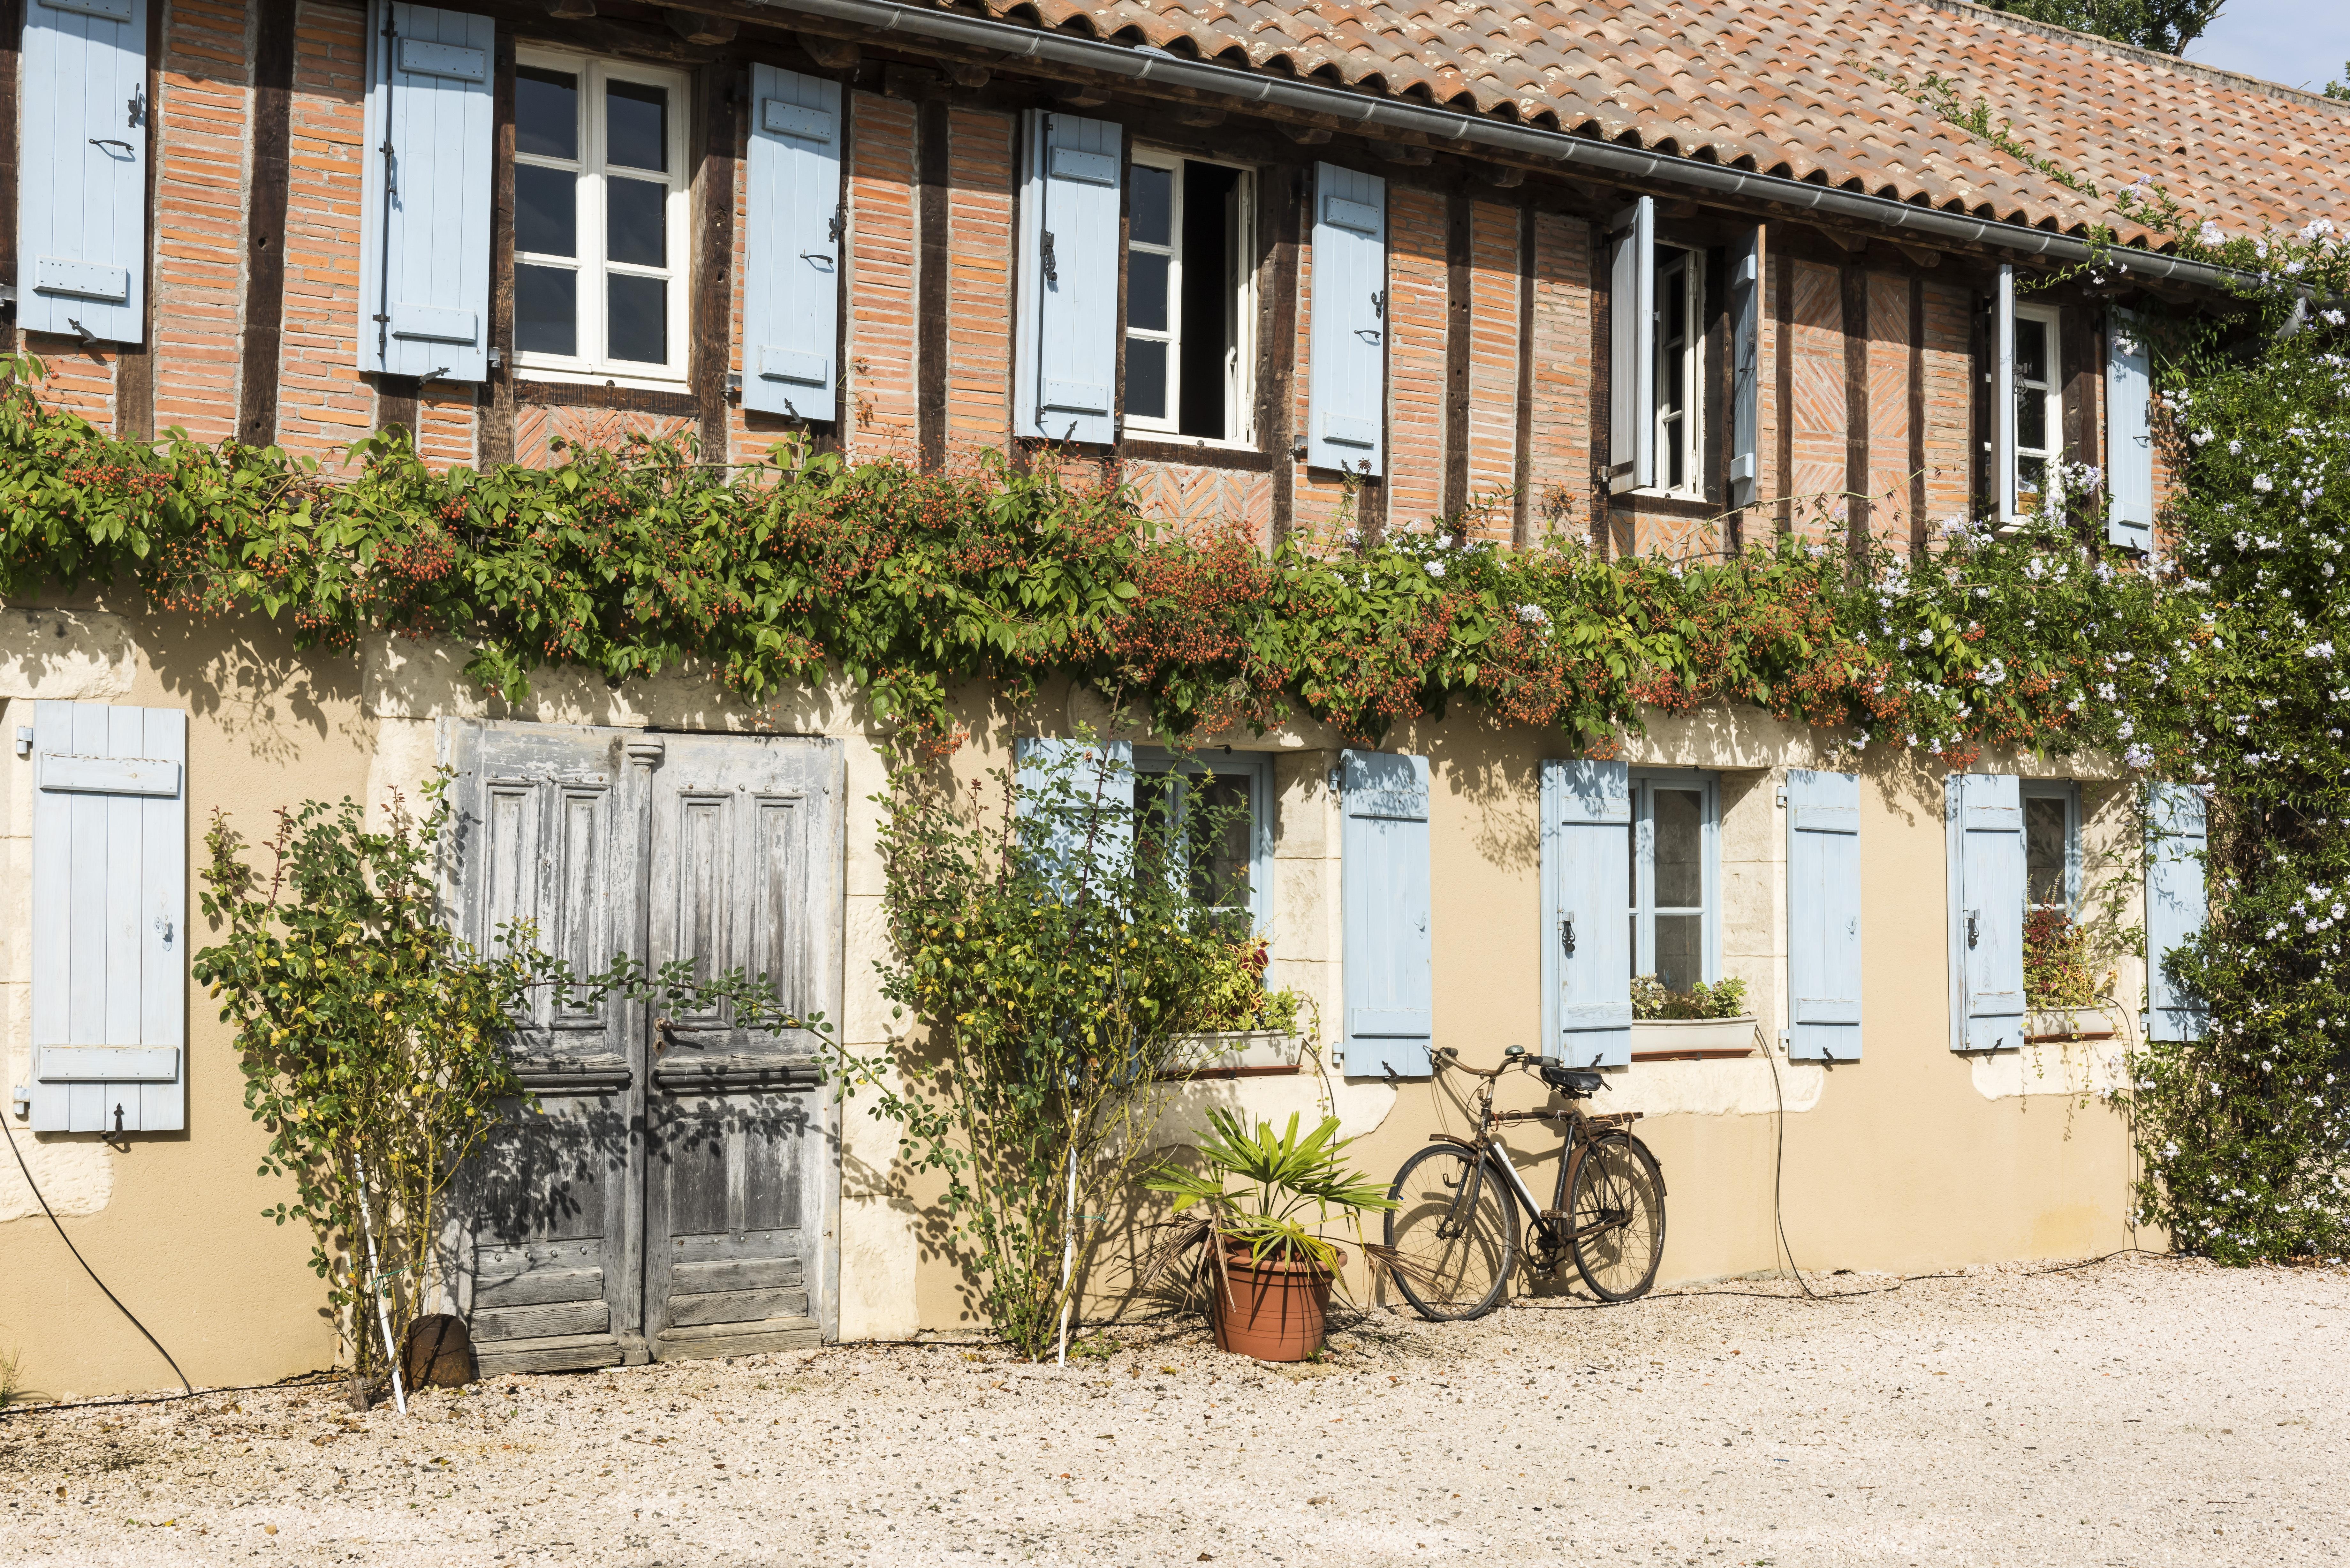 Fotos gratis : árbol, creativo, arquitectura, sol, casa, ventana ...